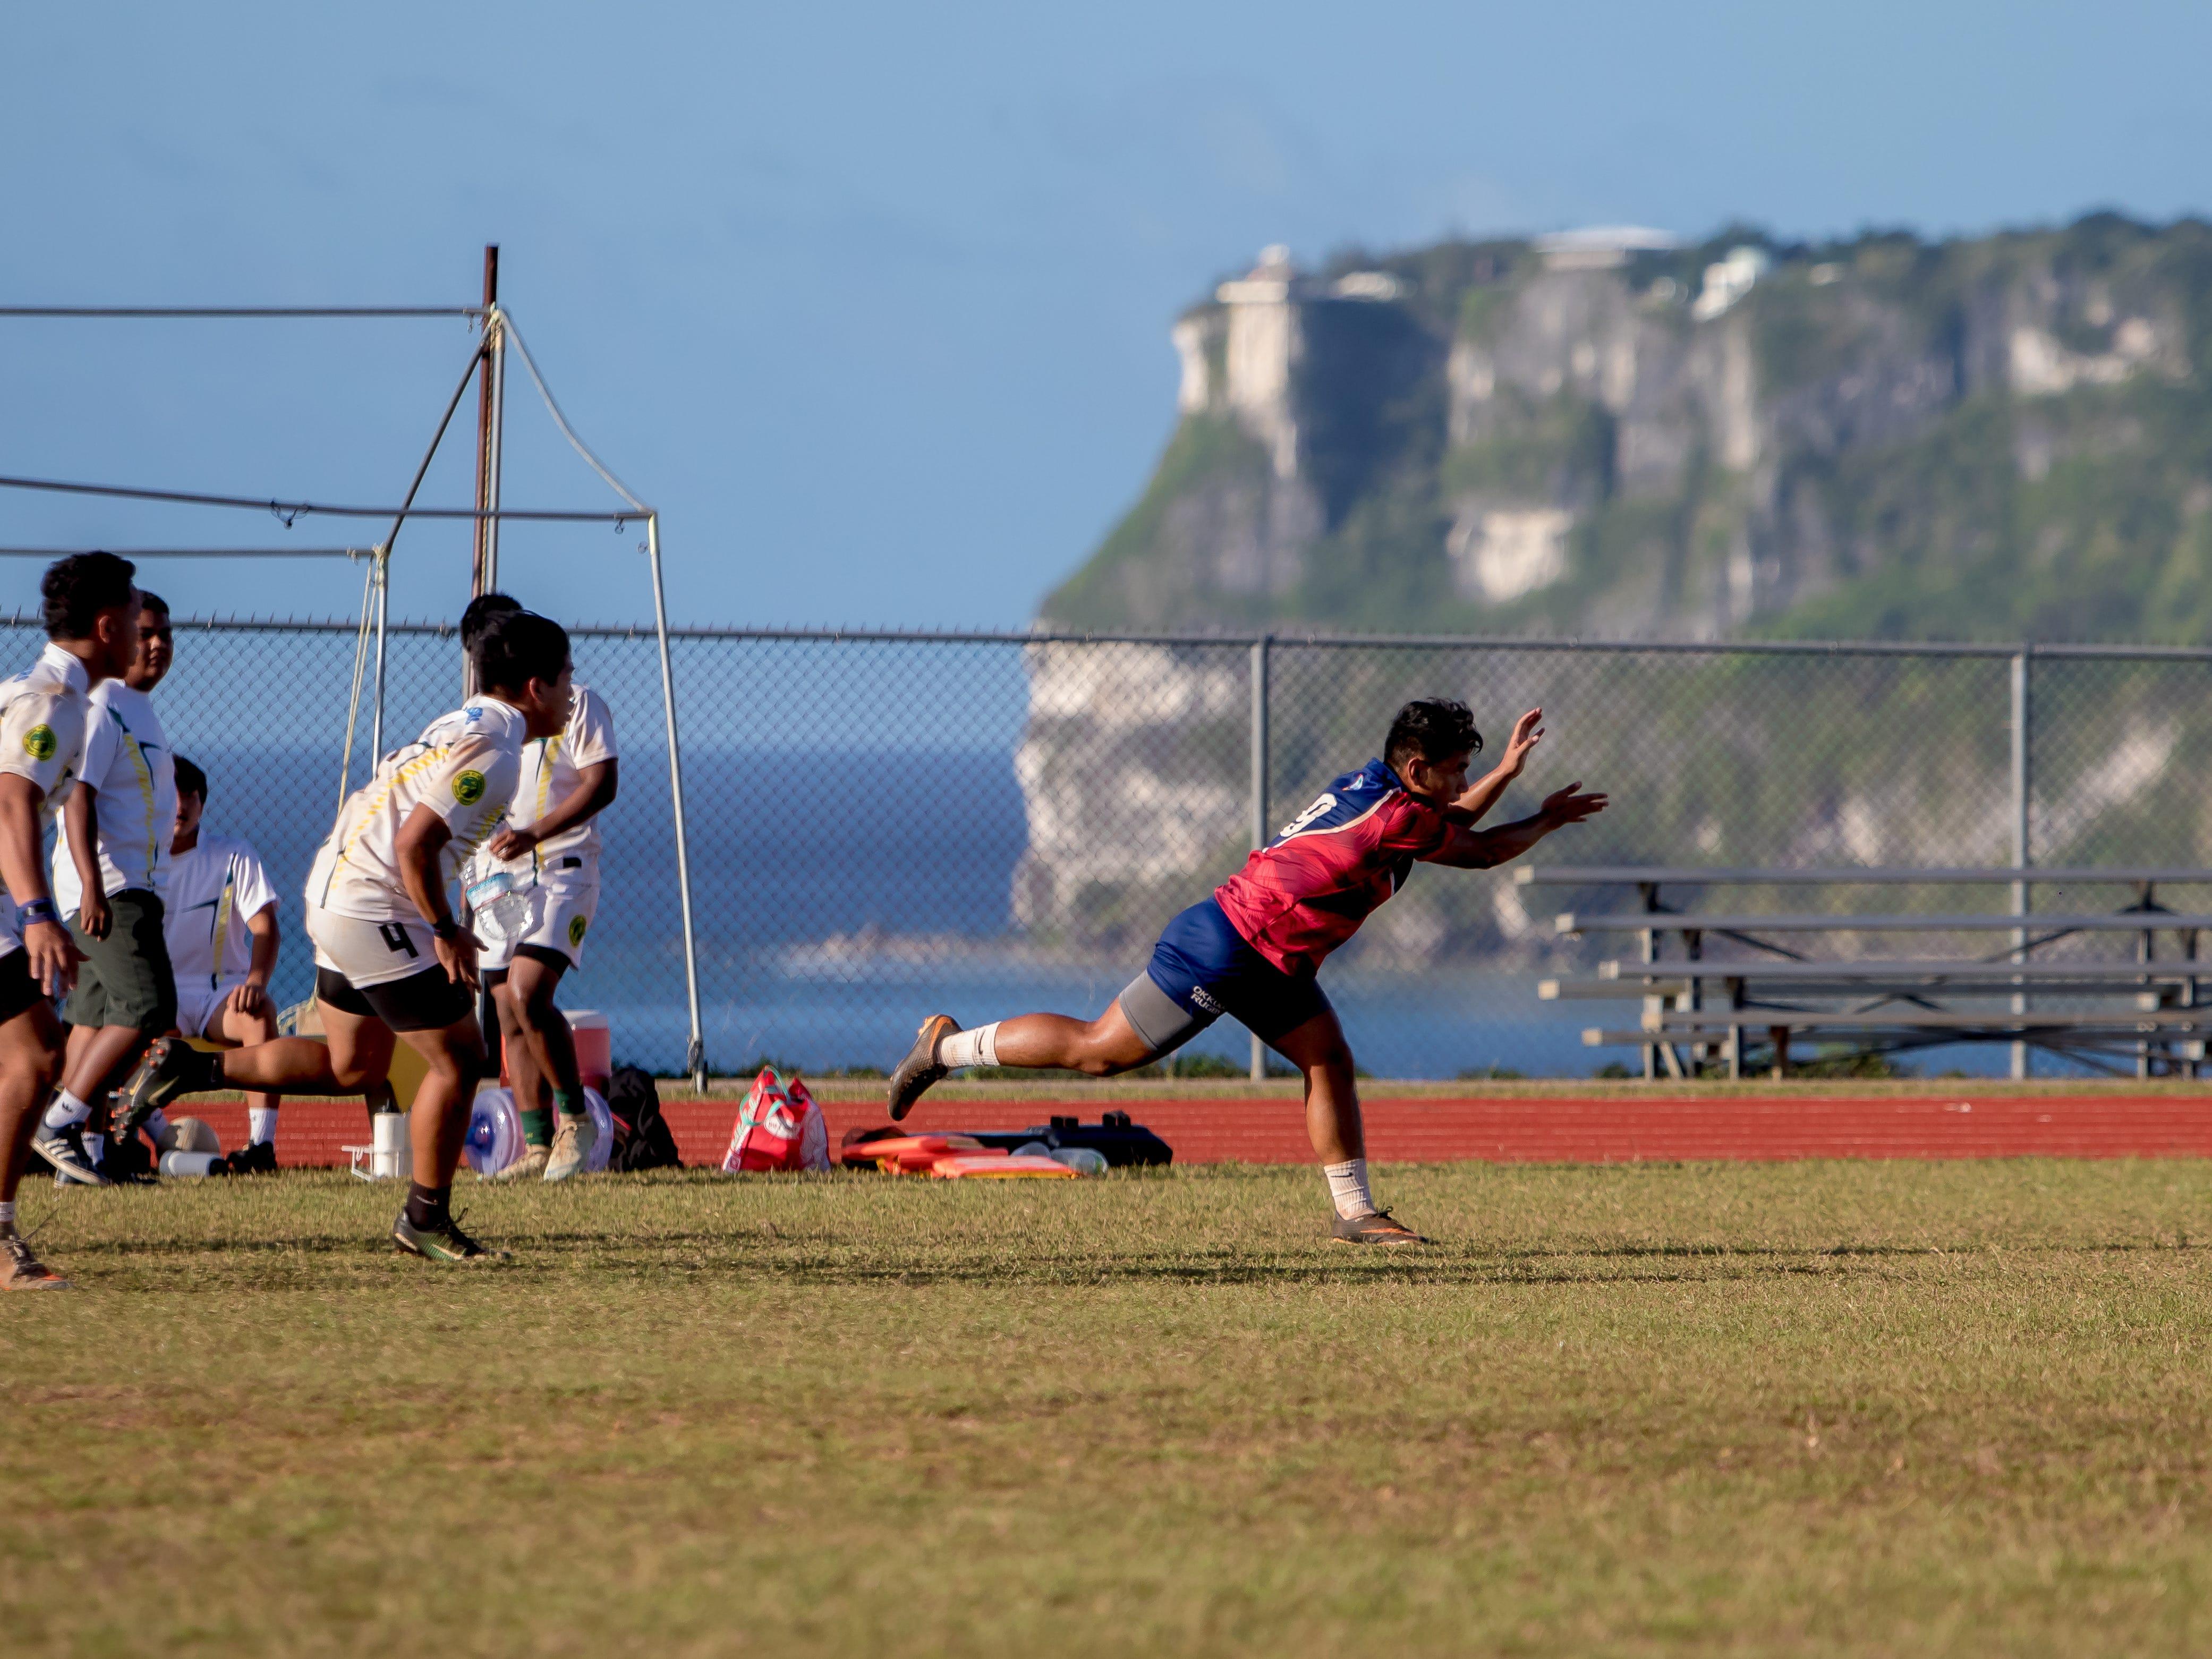 JFK faced Okkodo inj  an IIAAG/GRFU Boys Rugby match at Ramsey Field on March 6.